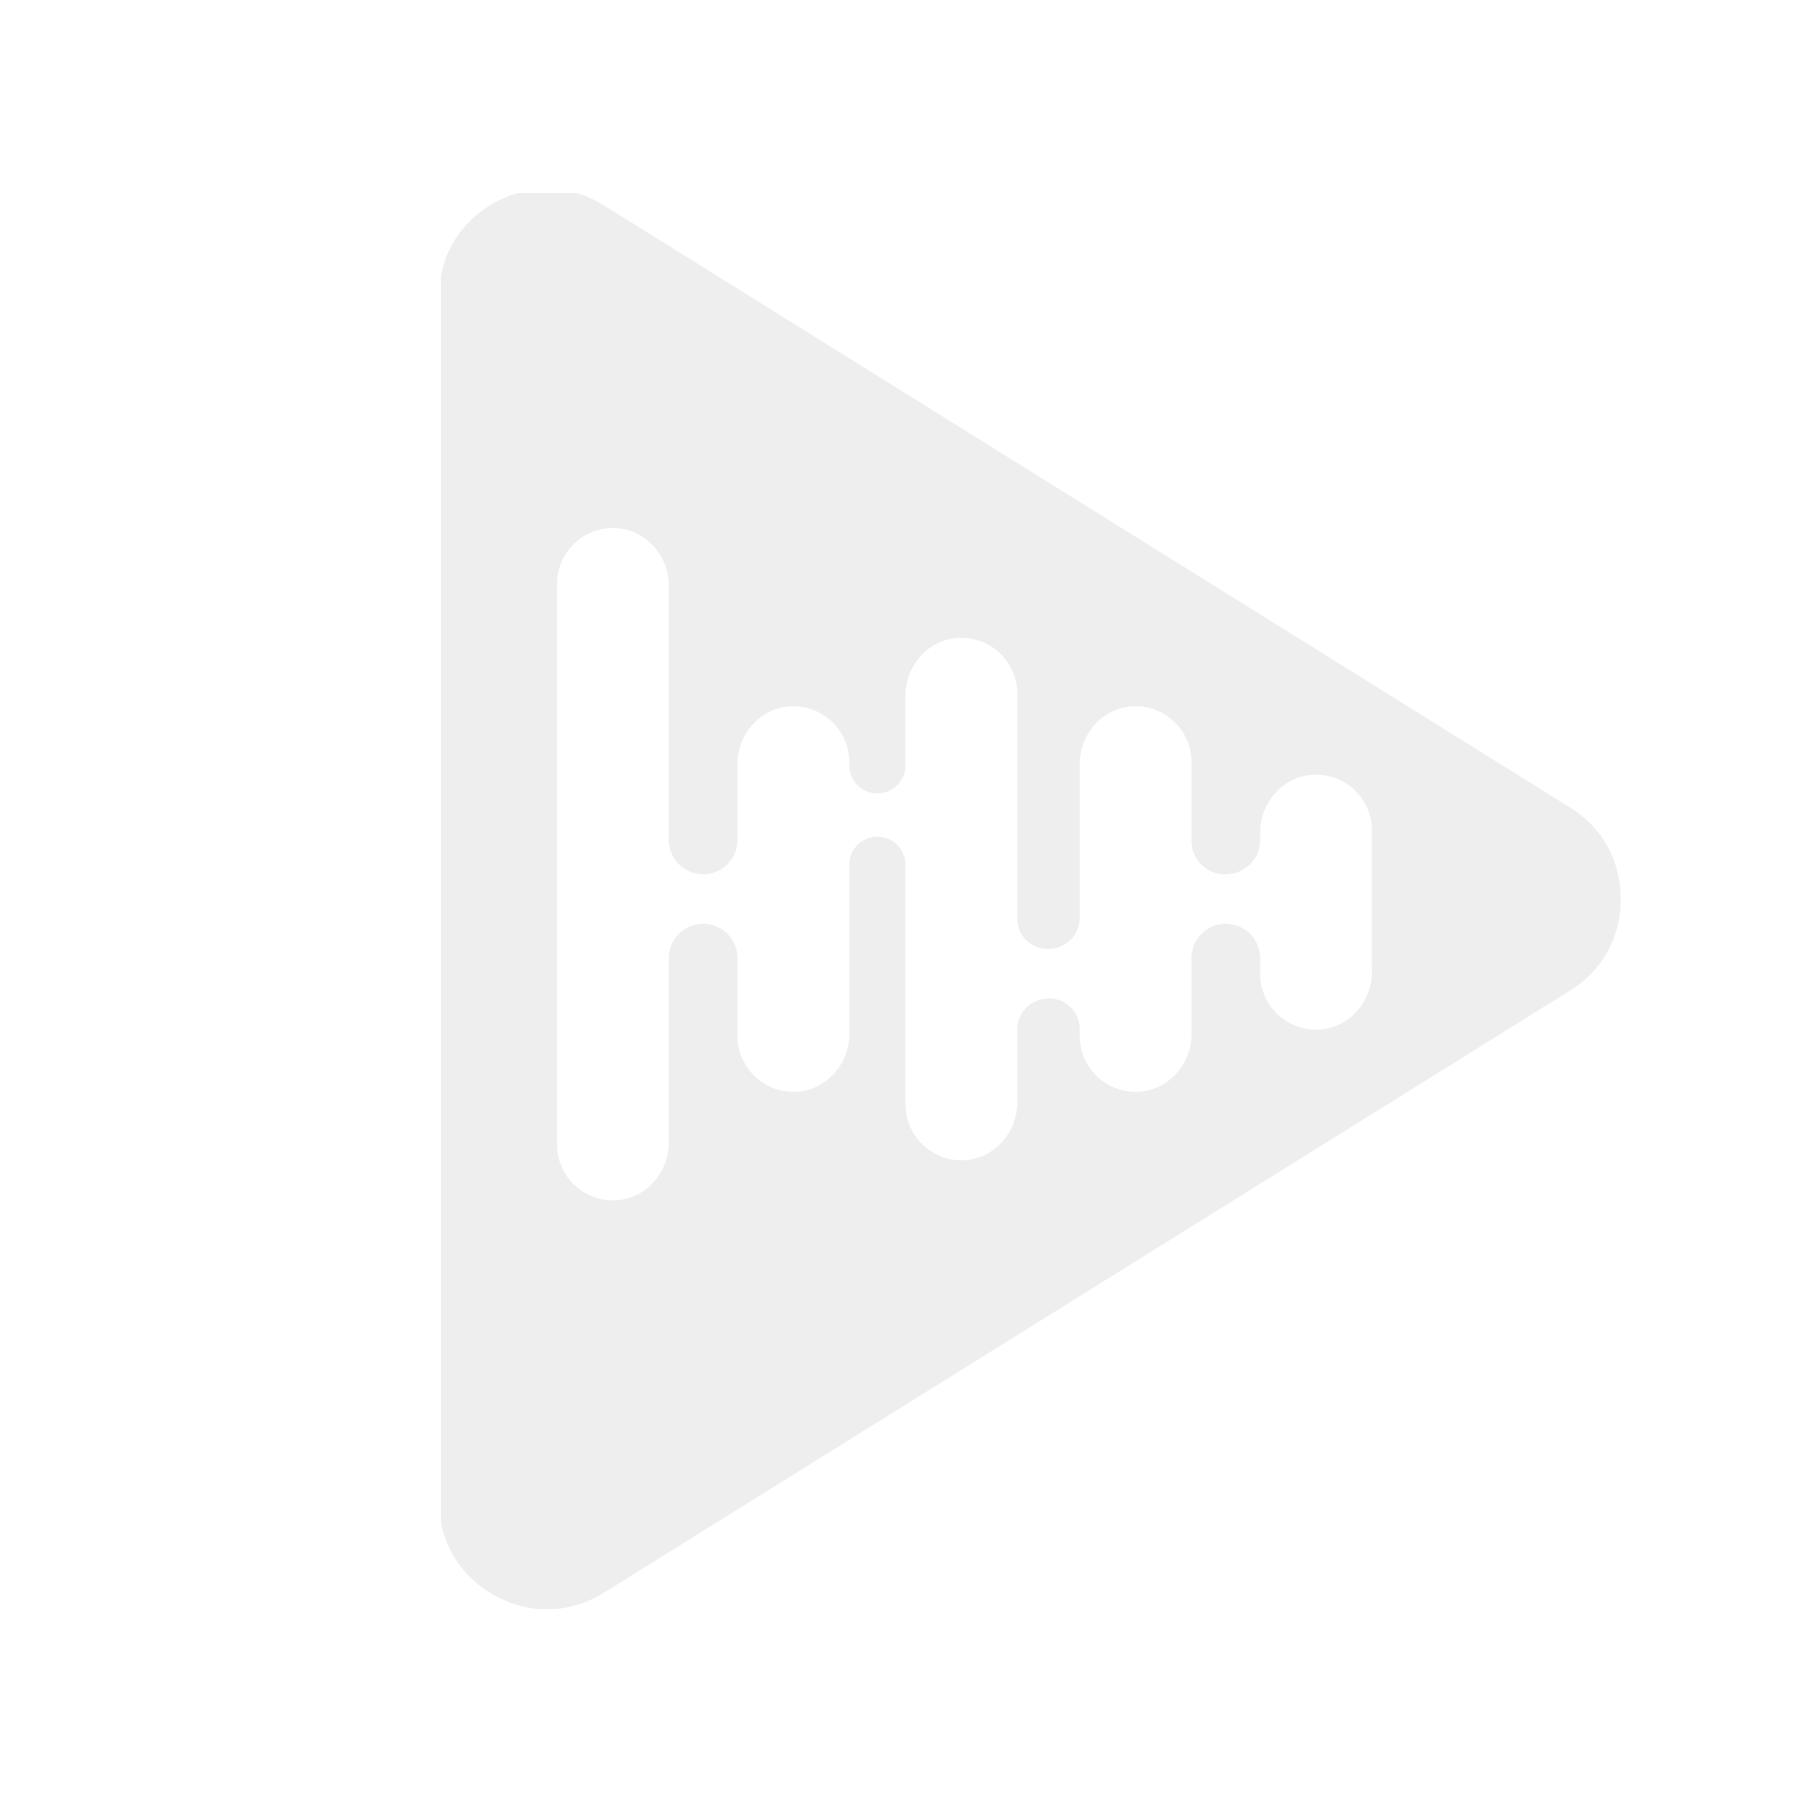 Skoddejuice Mandarin Aroma